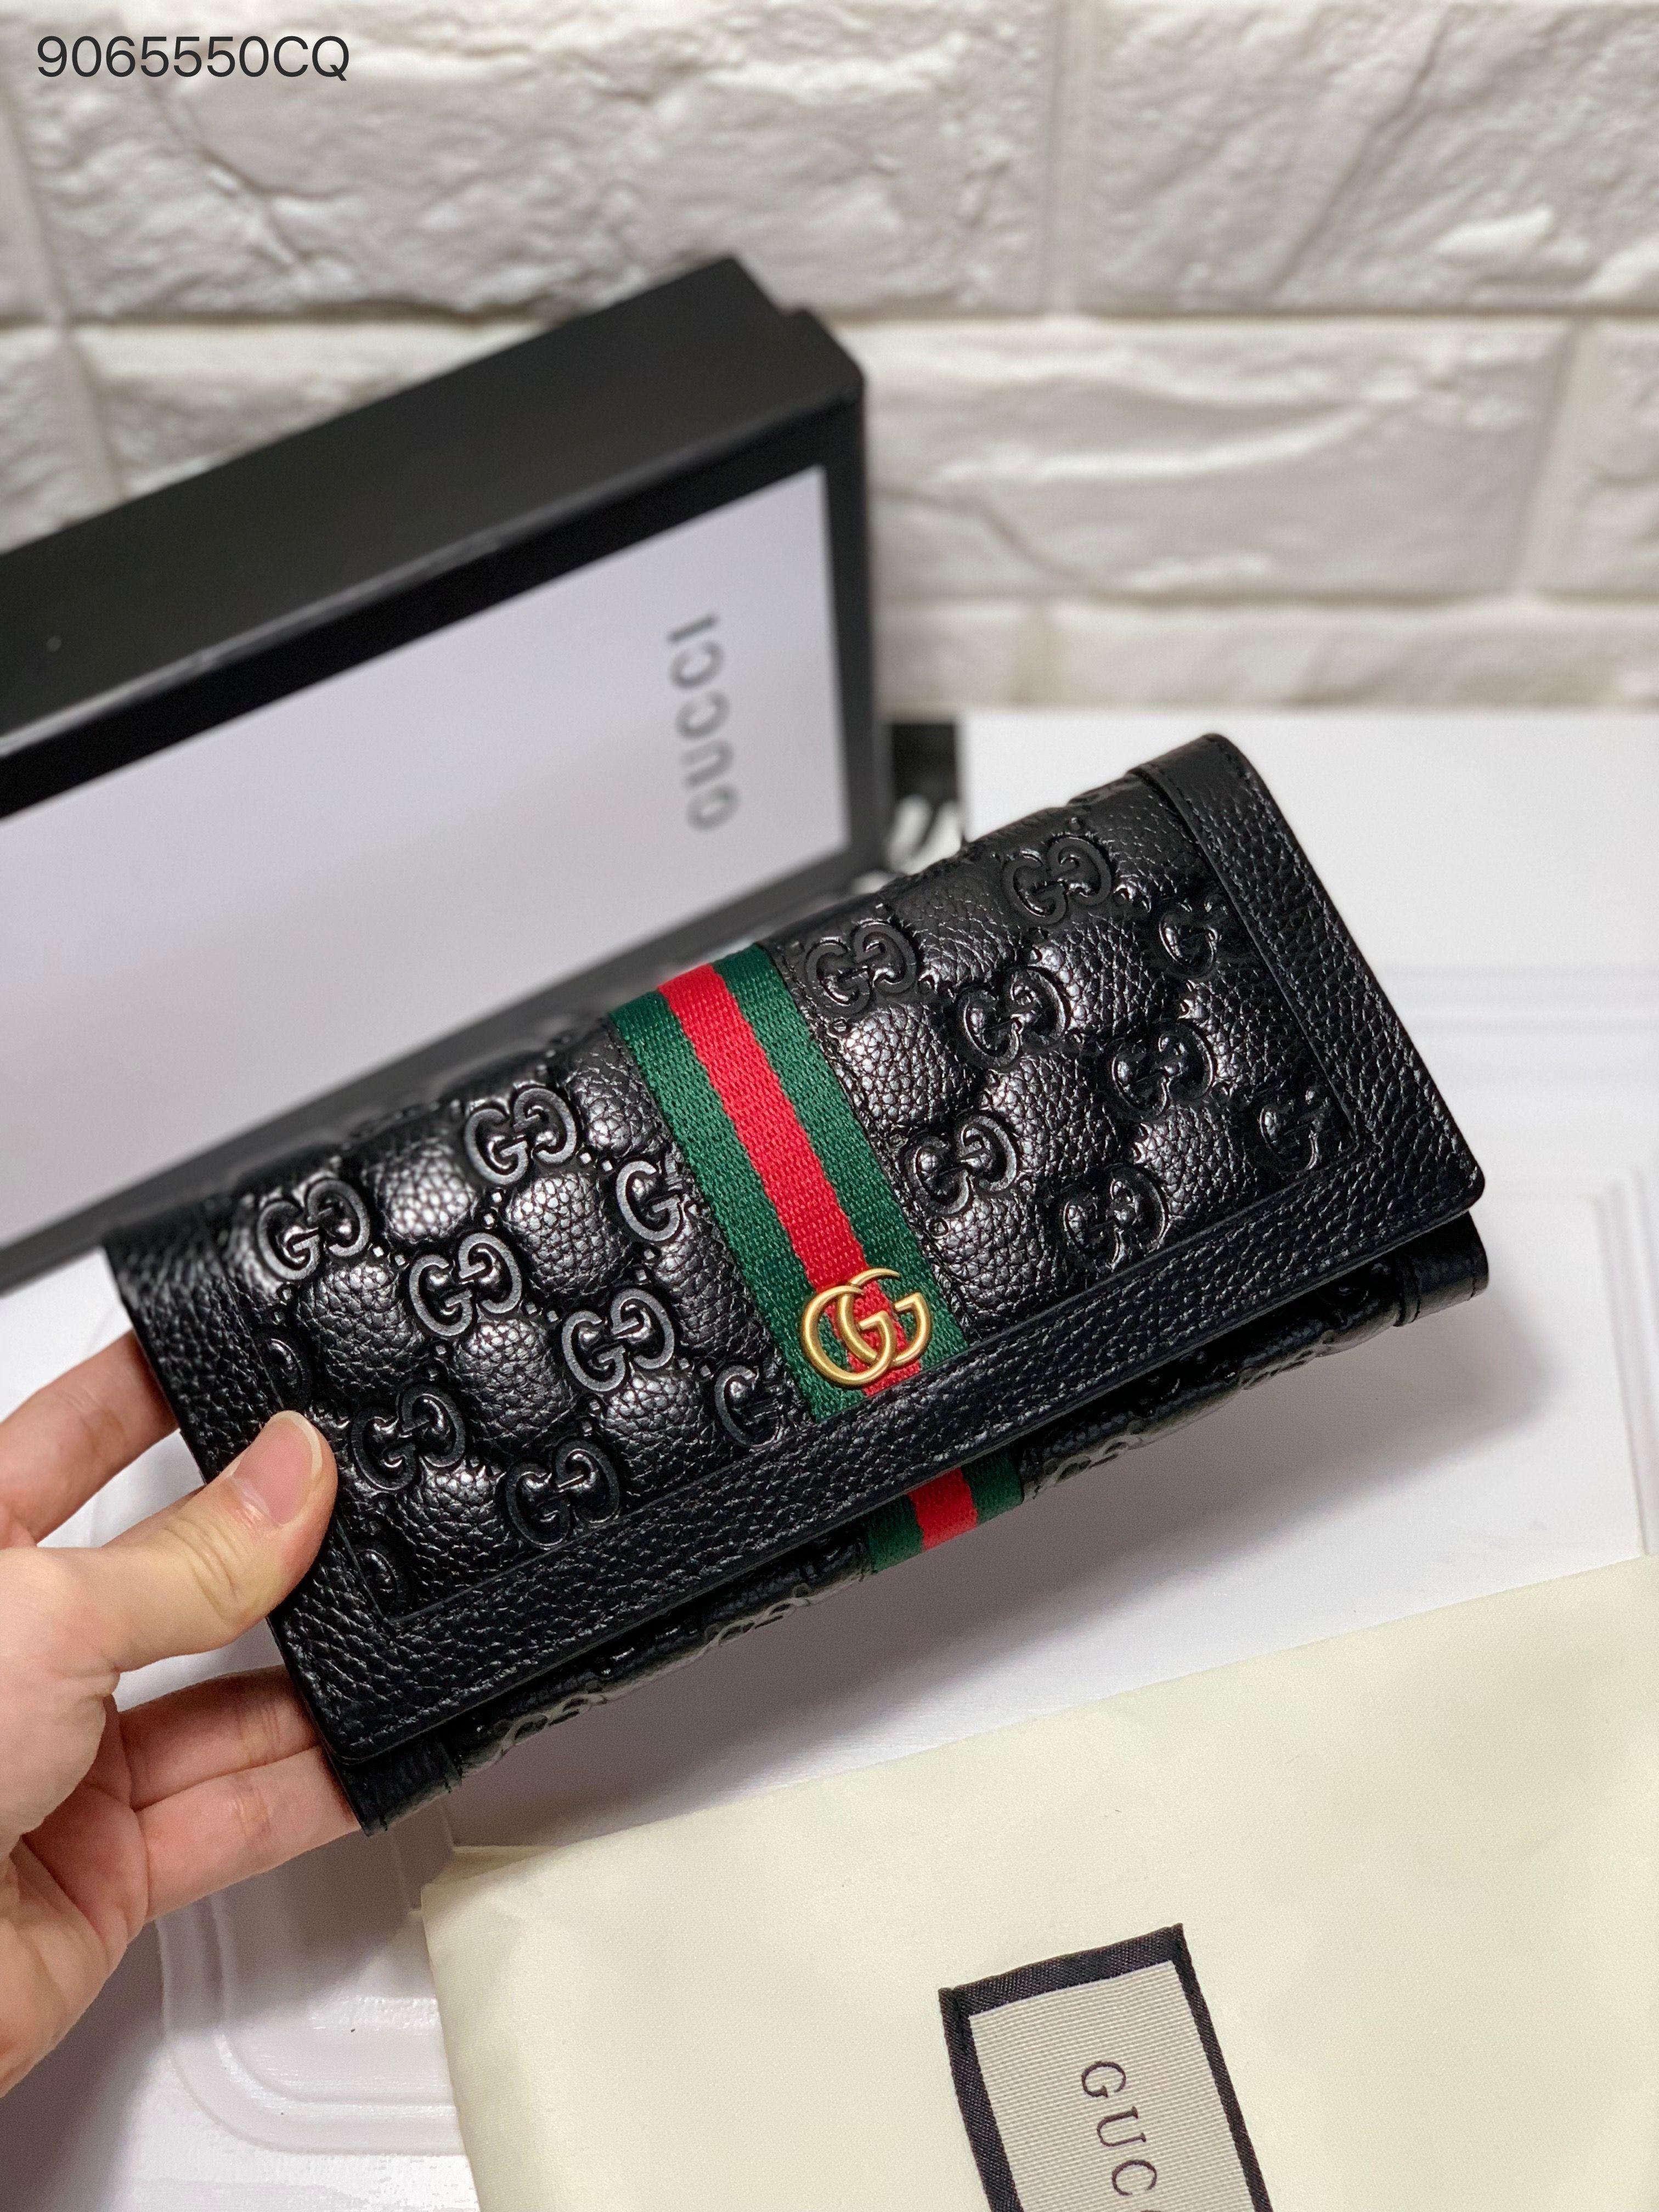 fc155bf0b0ba Gucci woman wallet 1:1 #gucciwalletwomens | Handbags in 2019 | Gucci ...